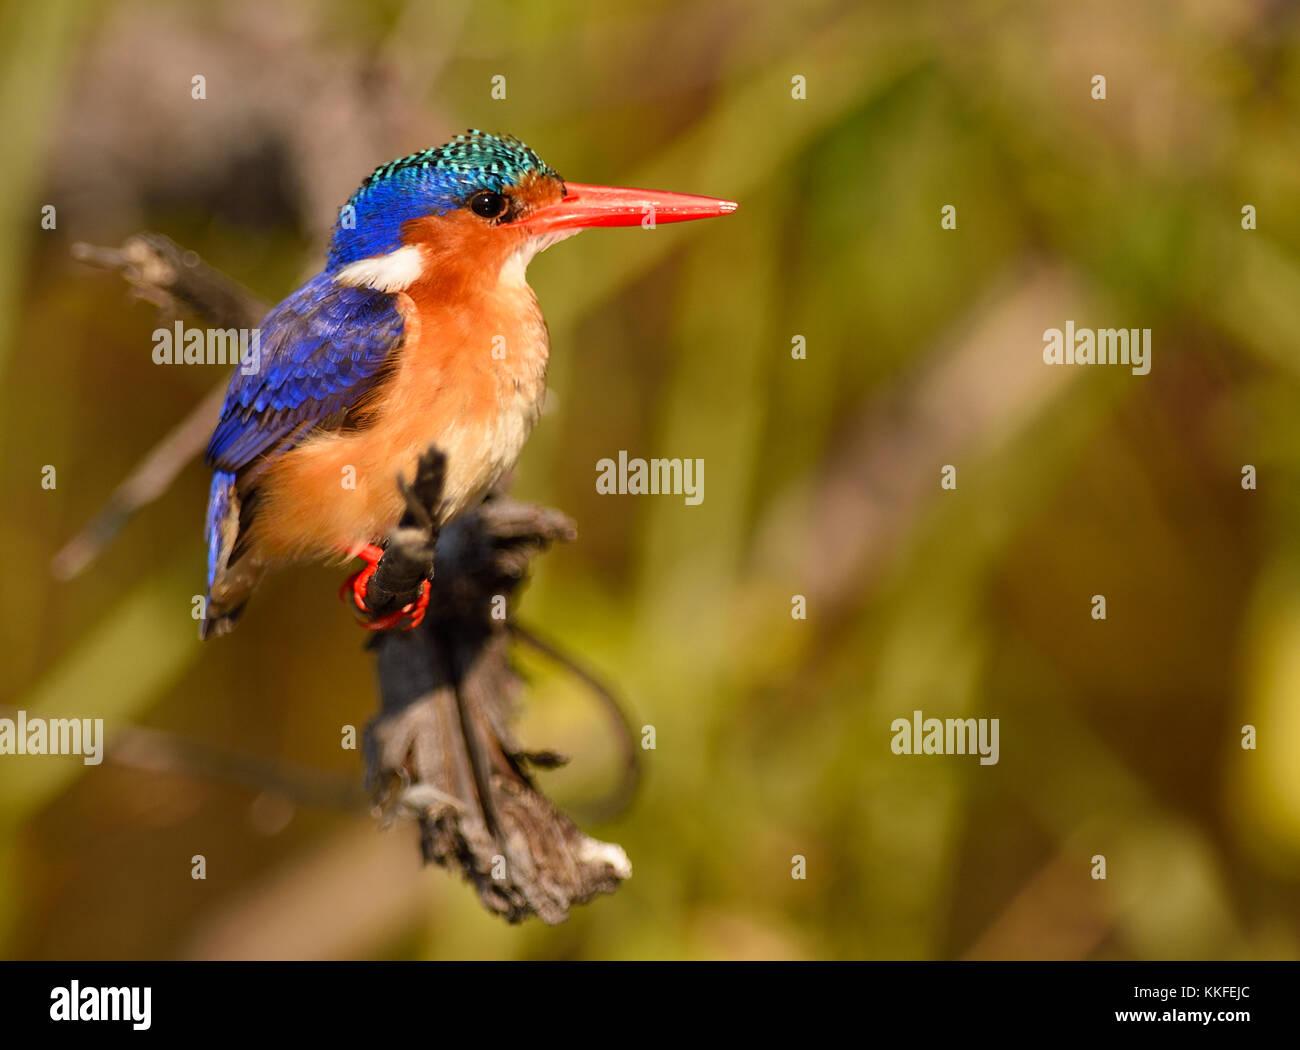 La faune sur la rivière Chobe, au Botswana Photo Stock